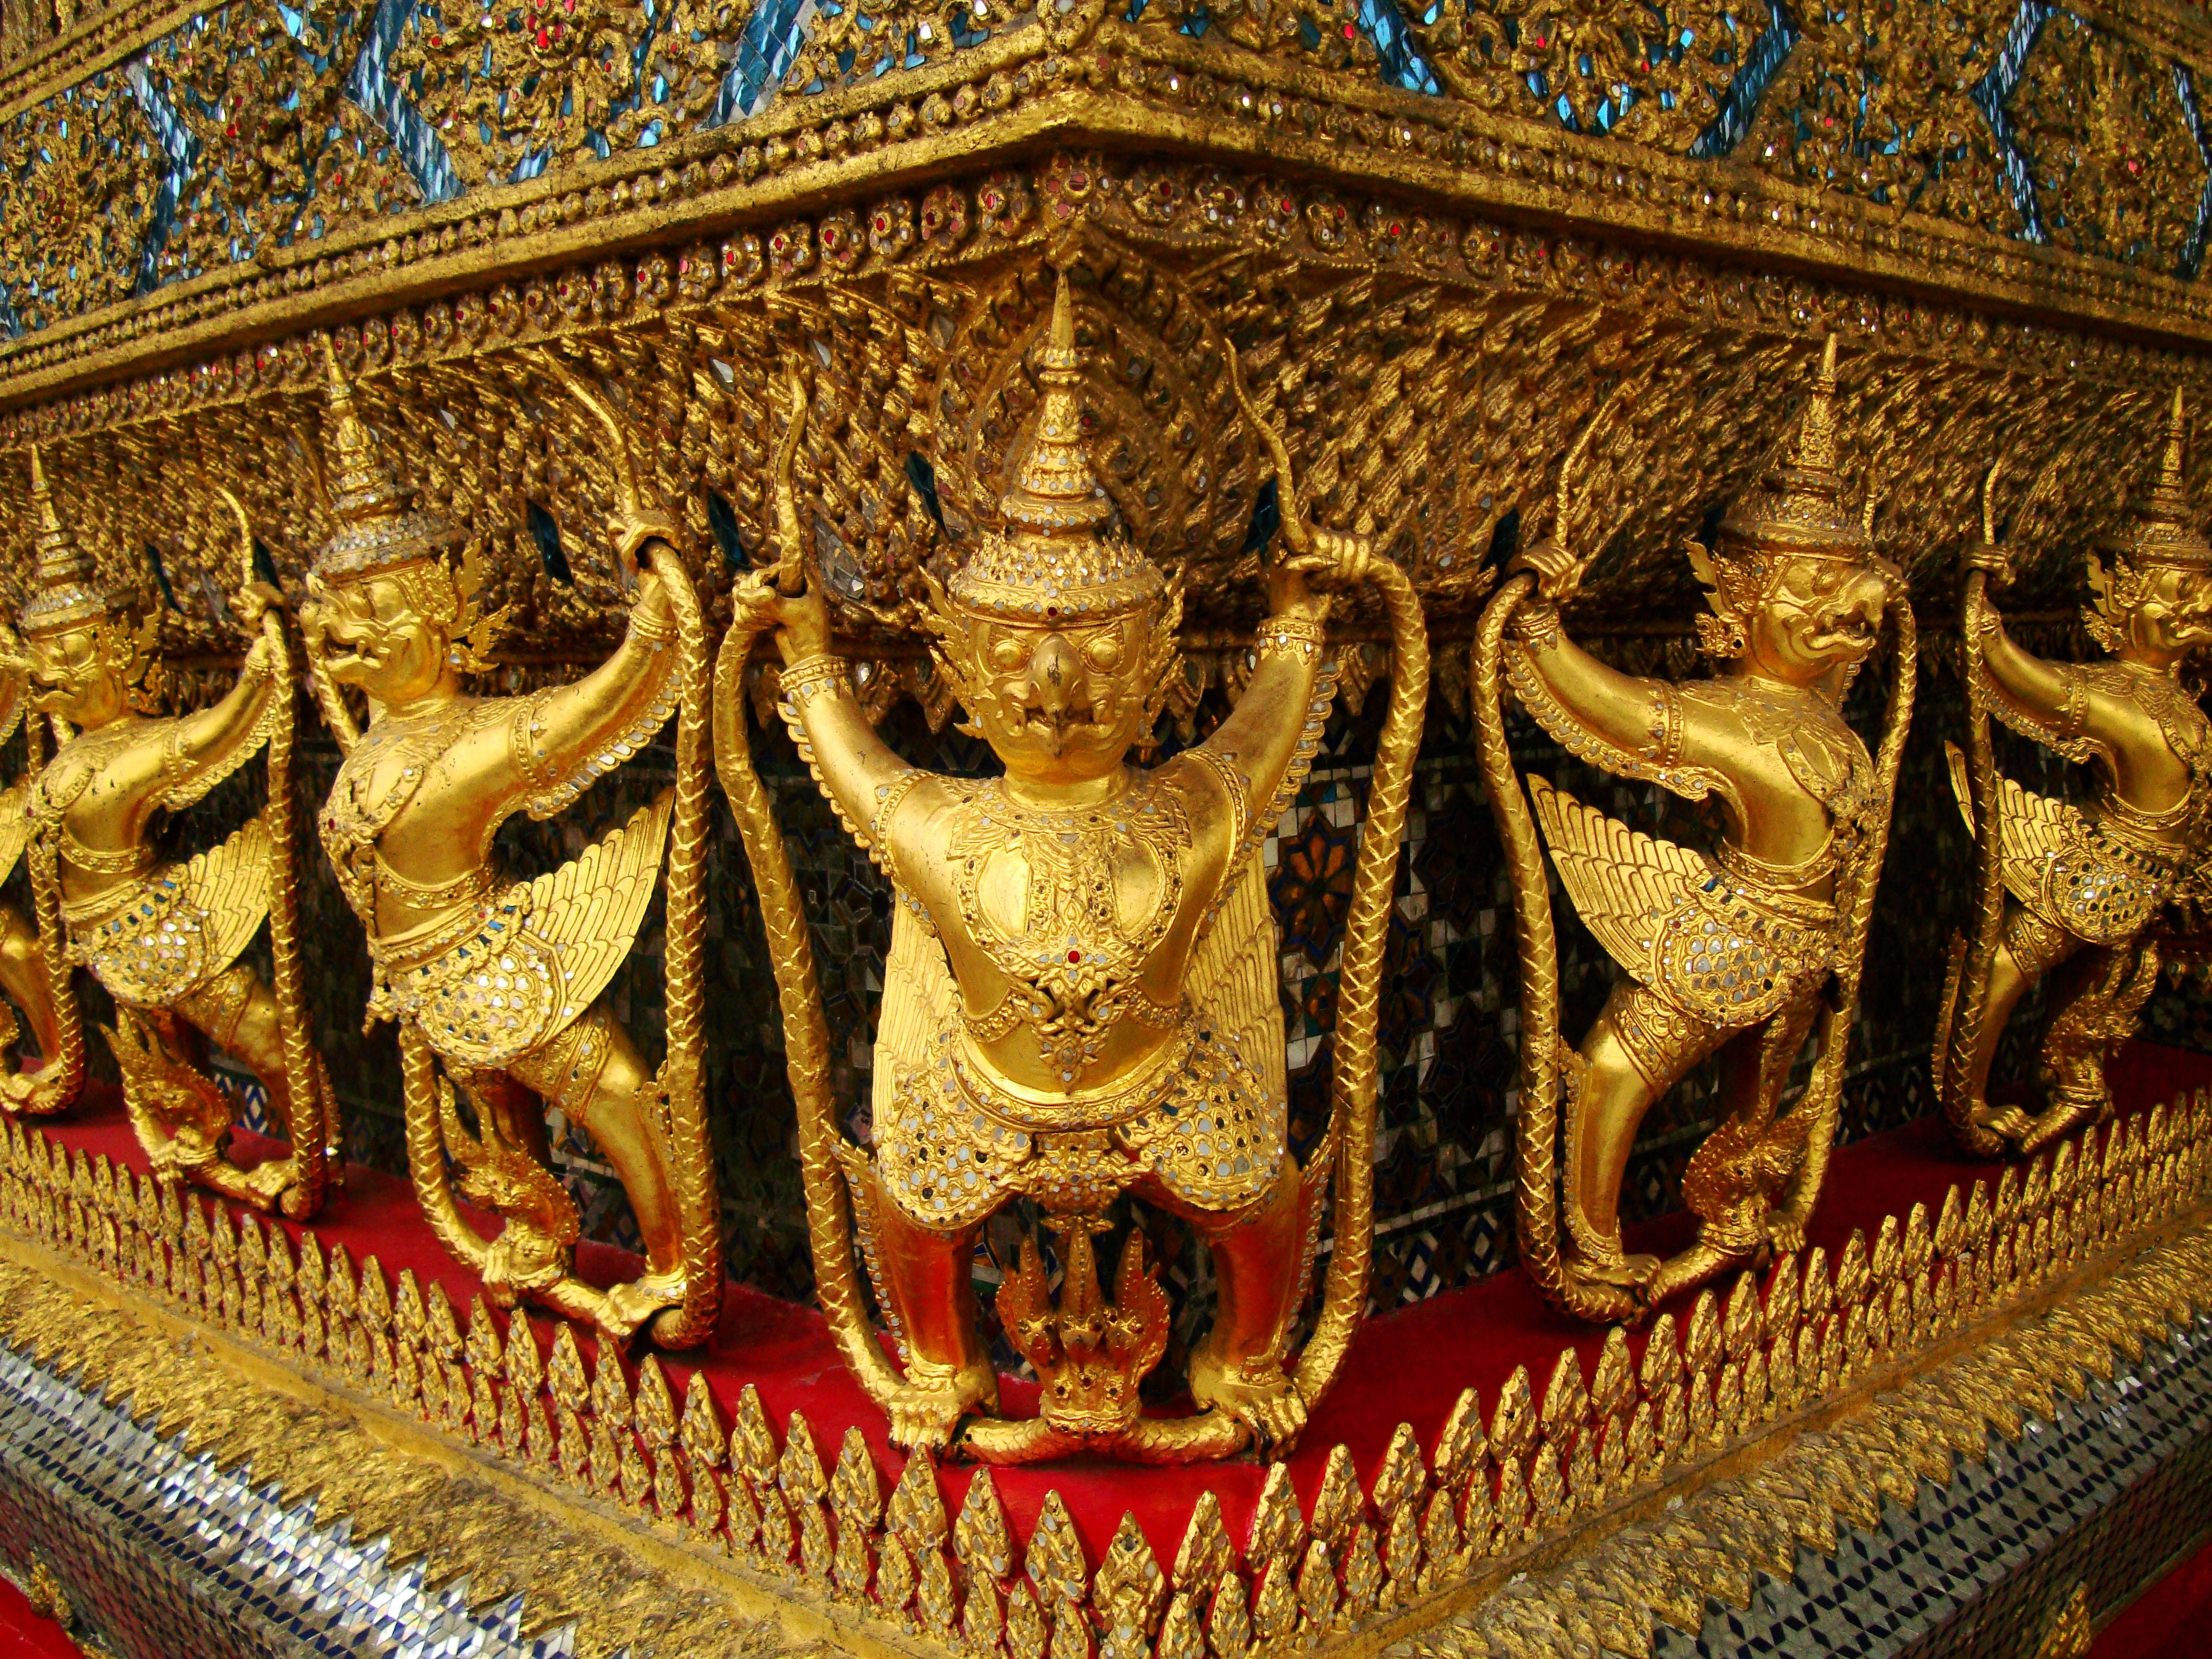 10 Temple of the Emerald Buddha intercrit designed walls pillars Grand Palace 03